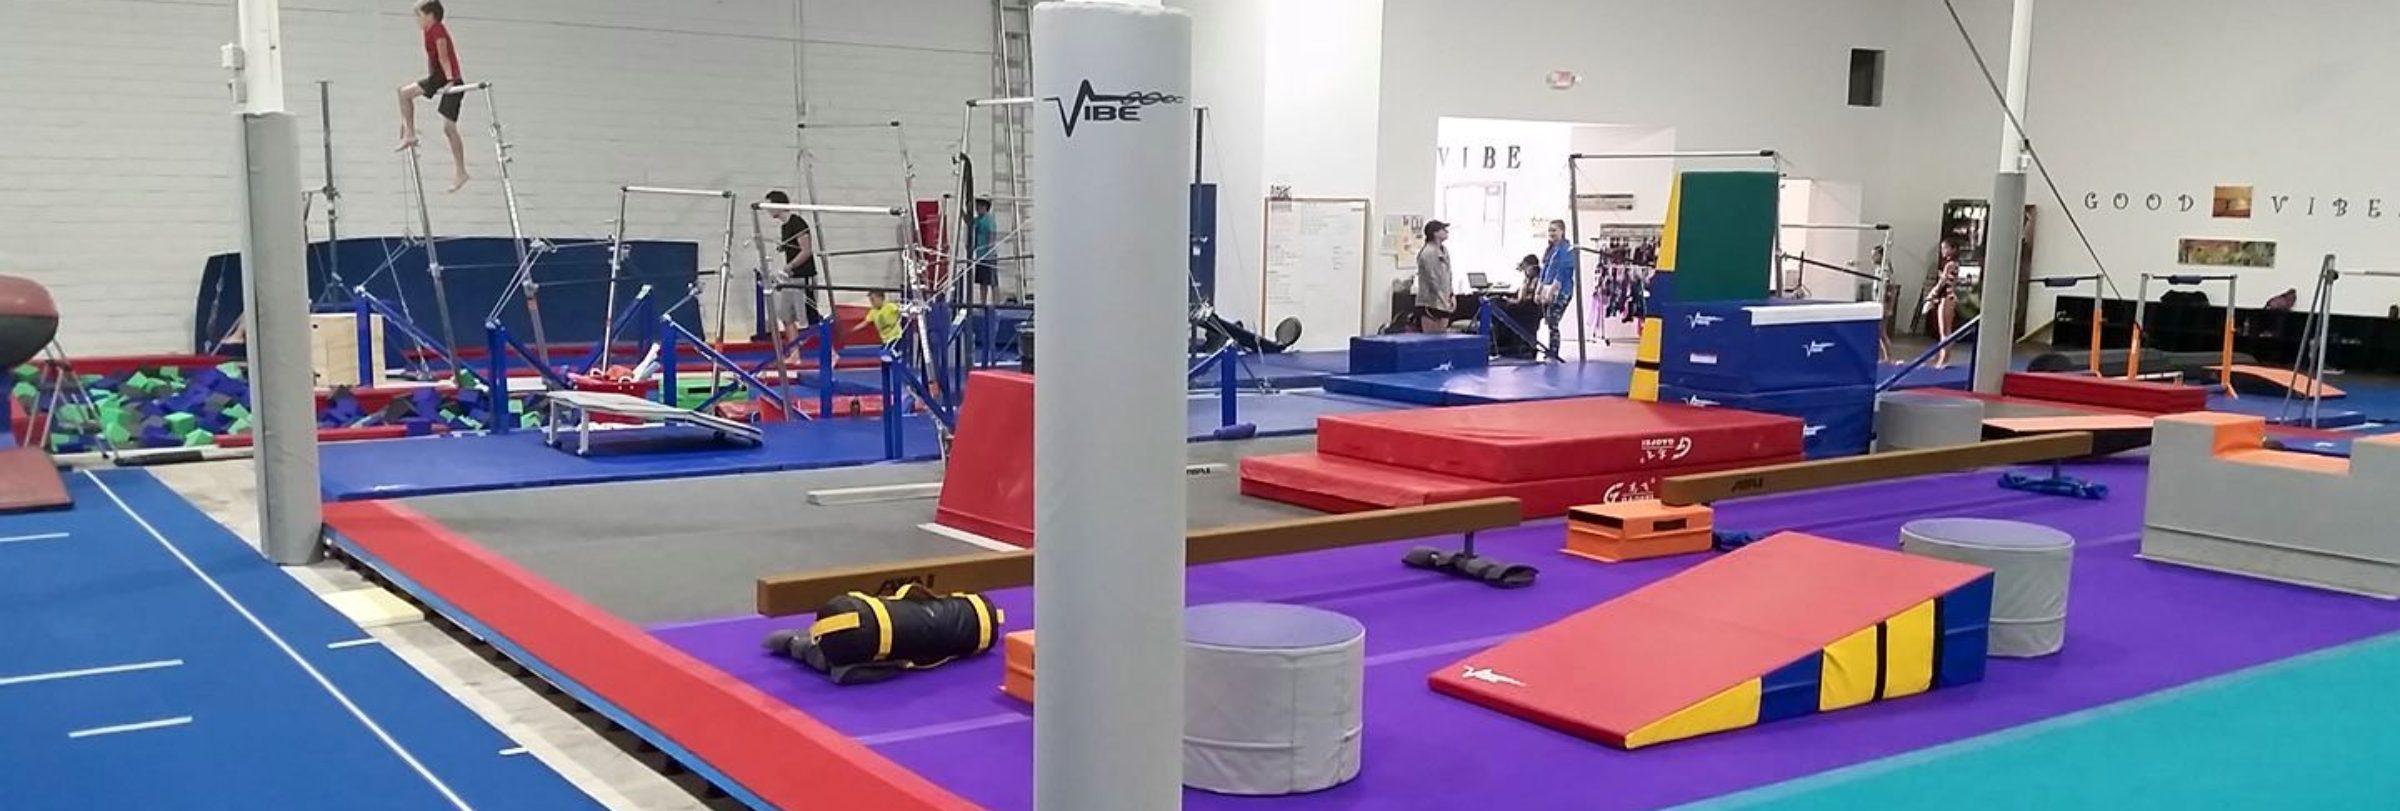 Vibe Gymnastics   Orange, California